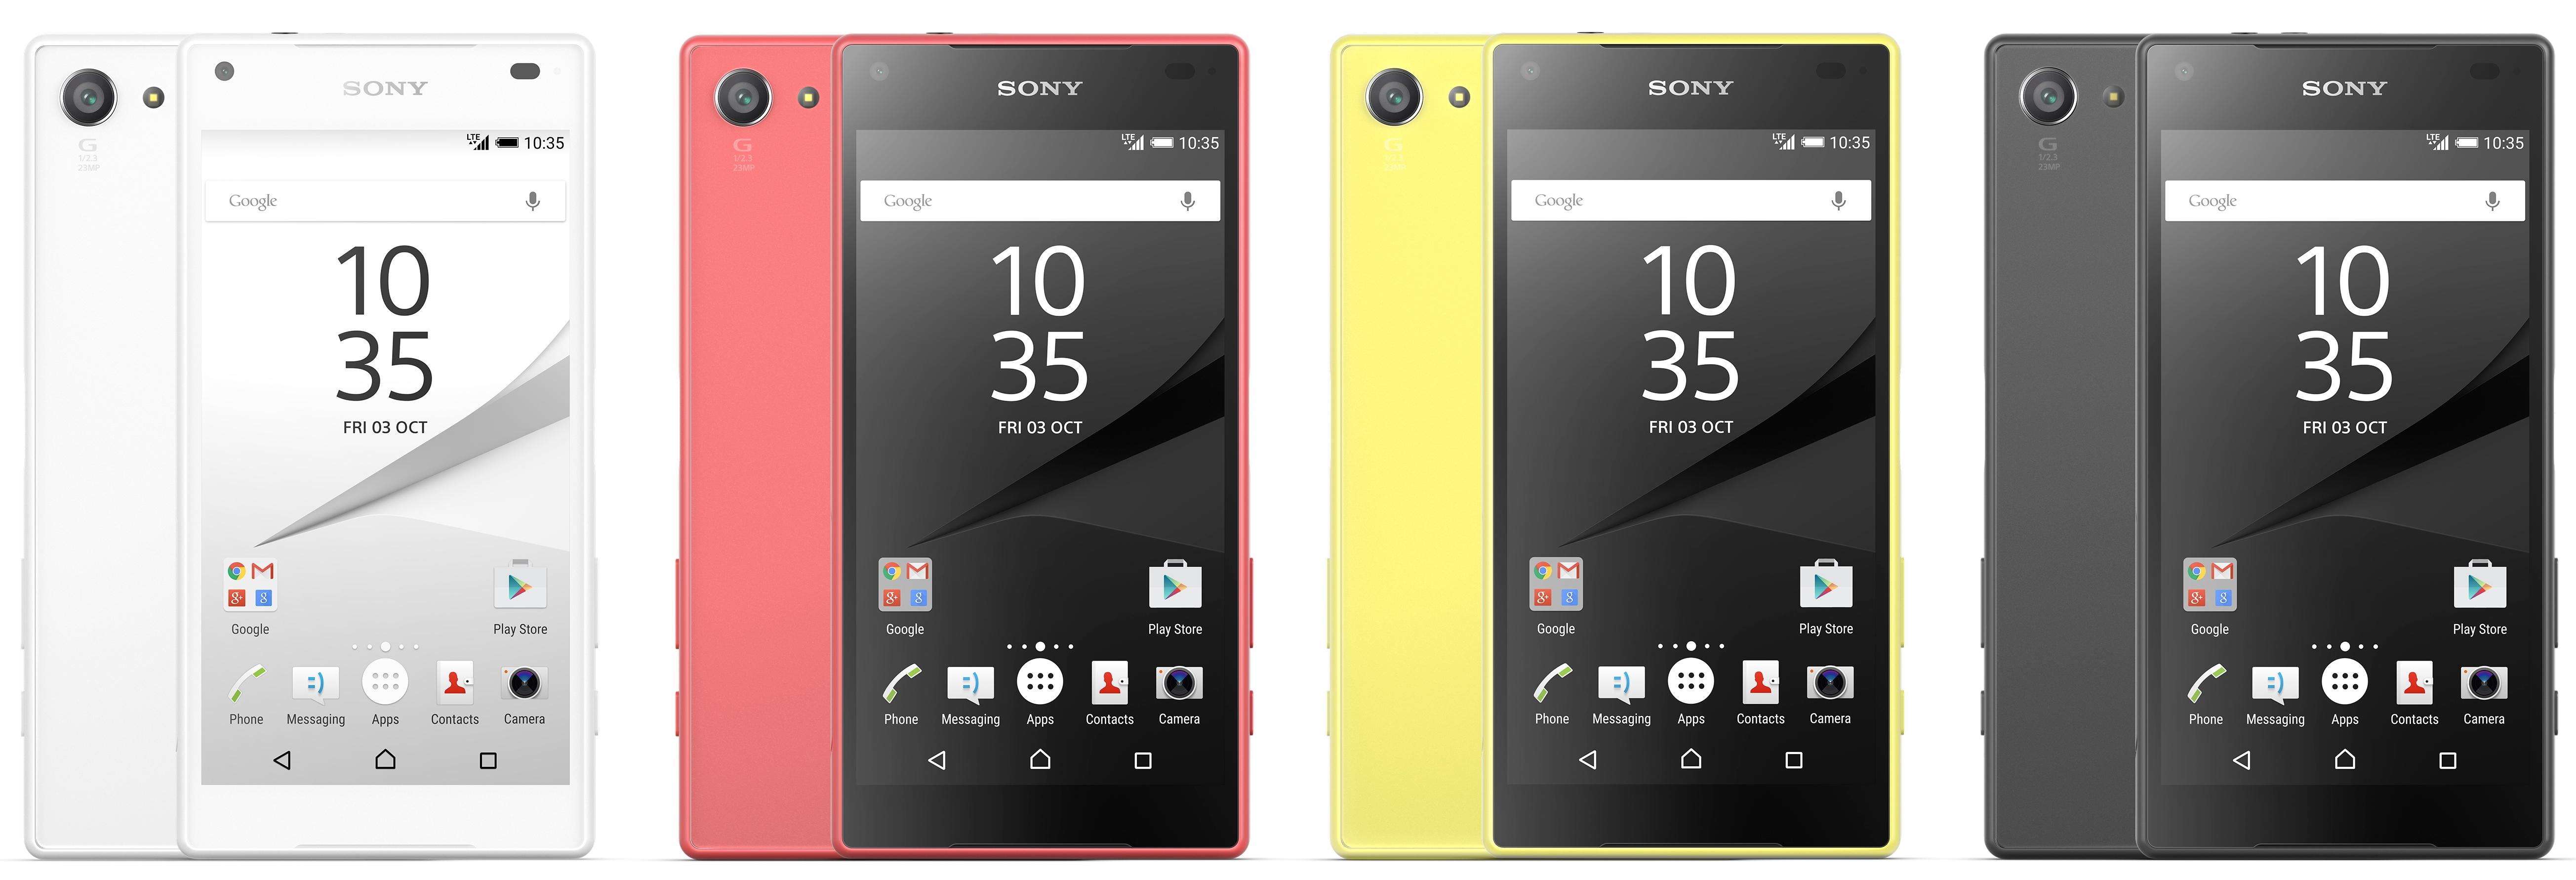 Sony-Xperia-Z5-Compact (1)